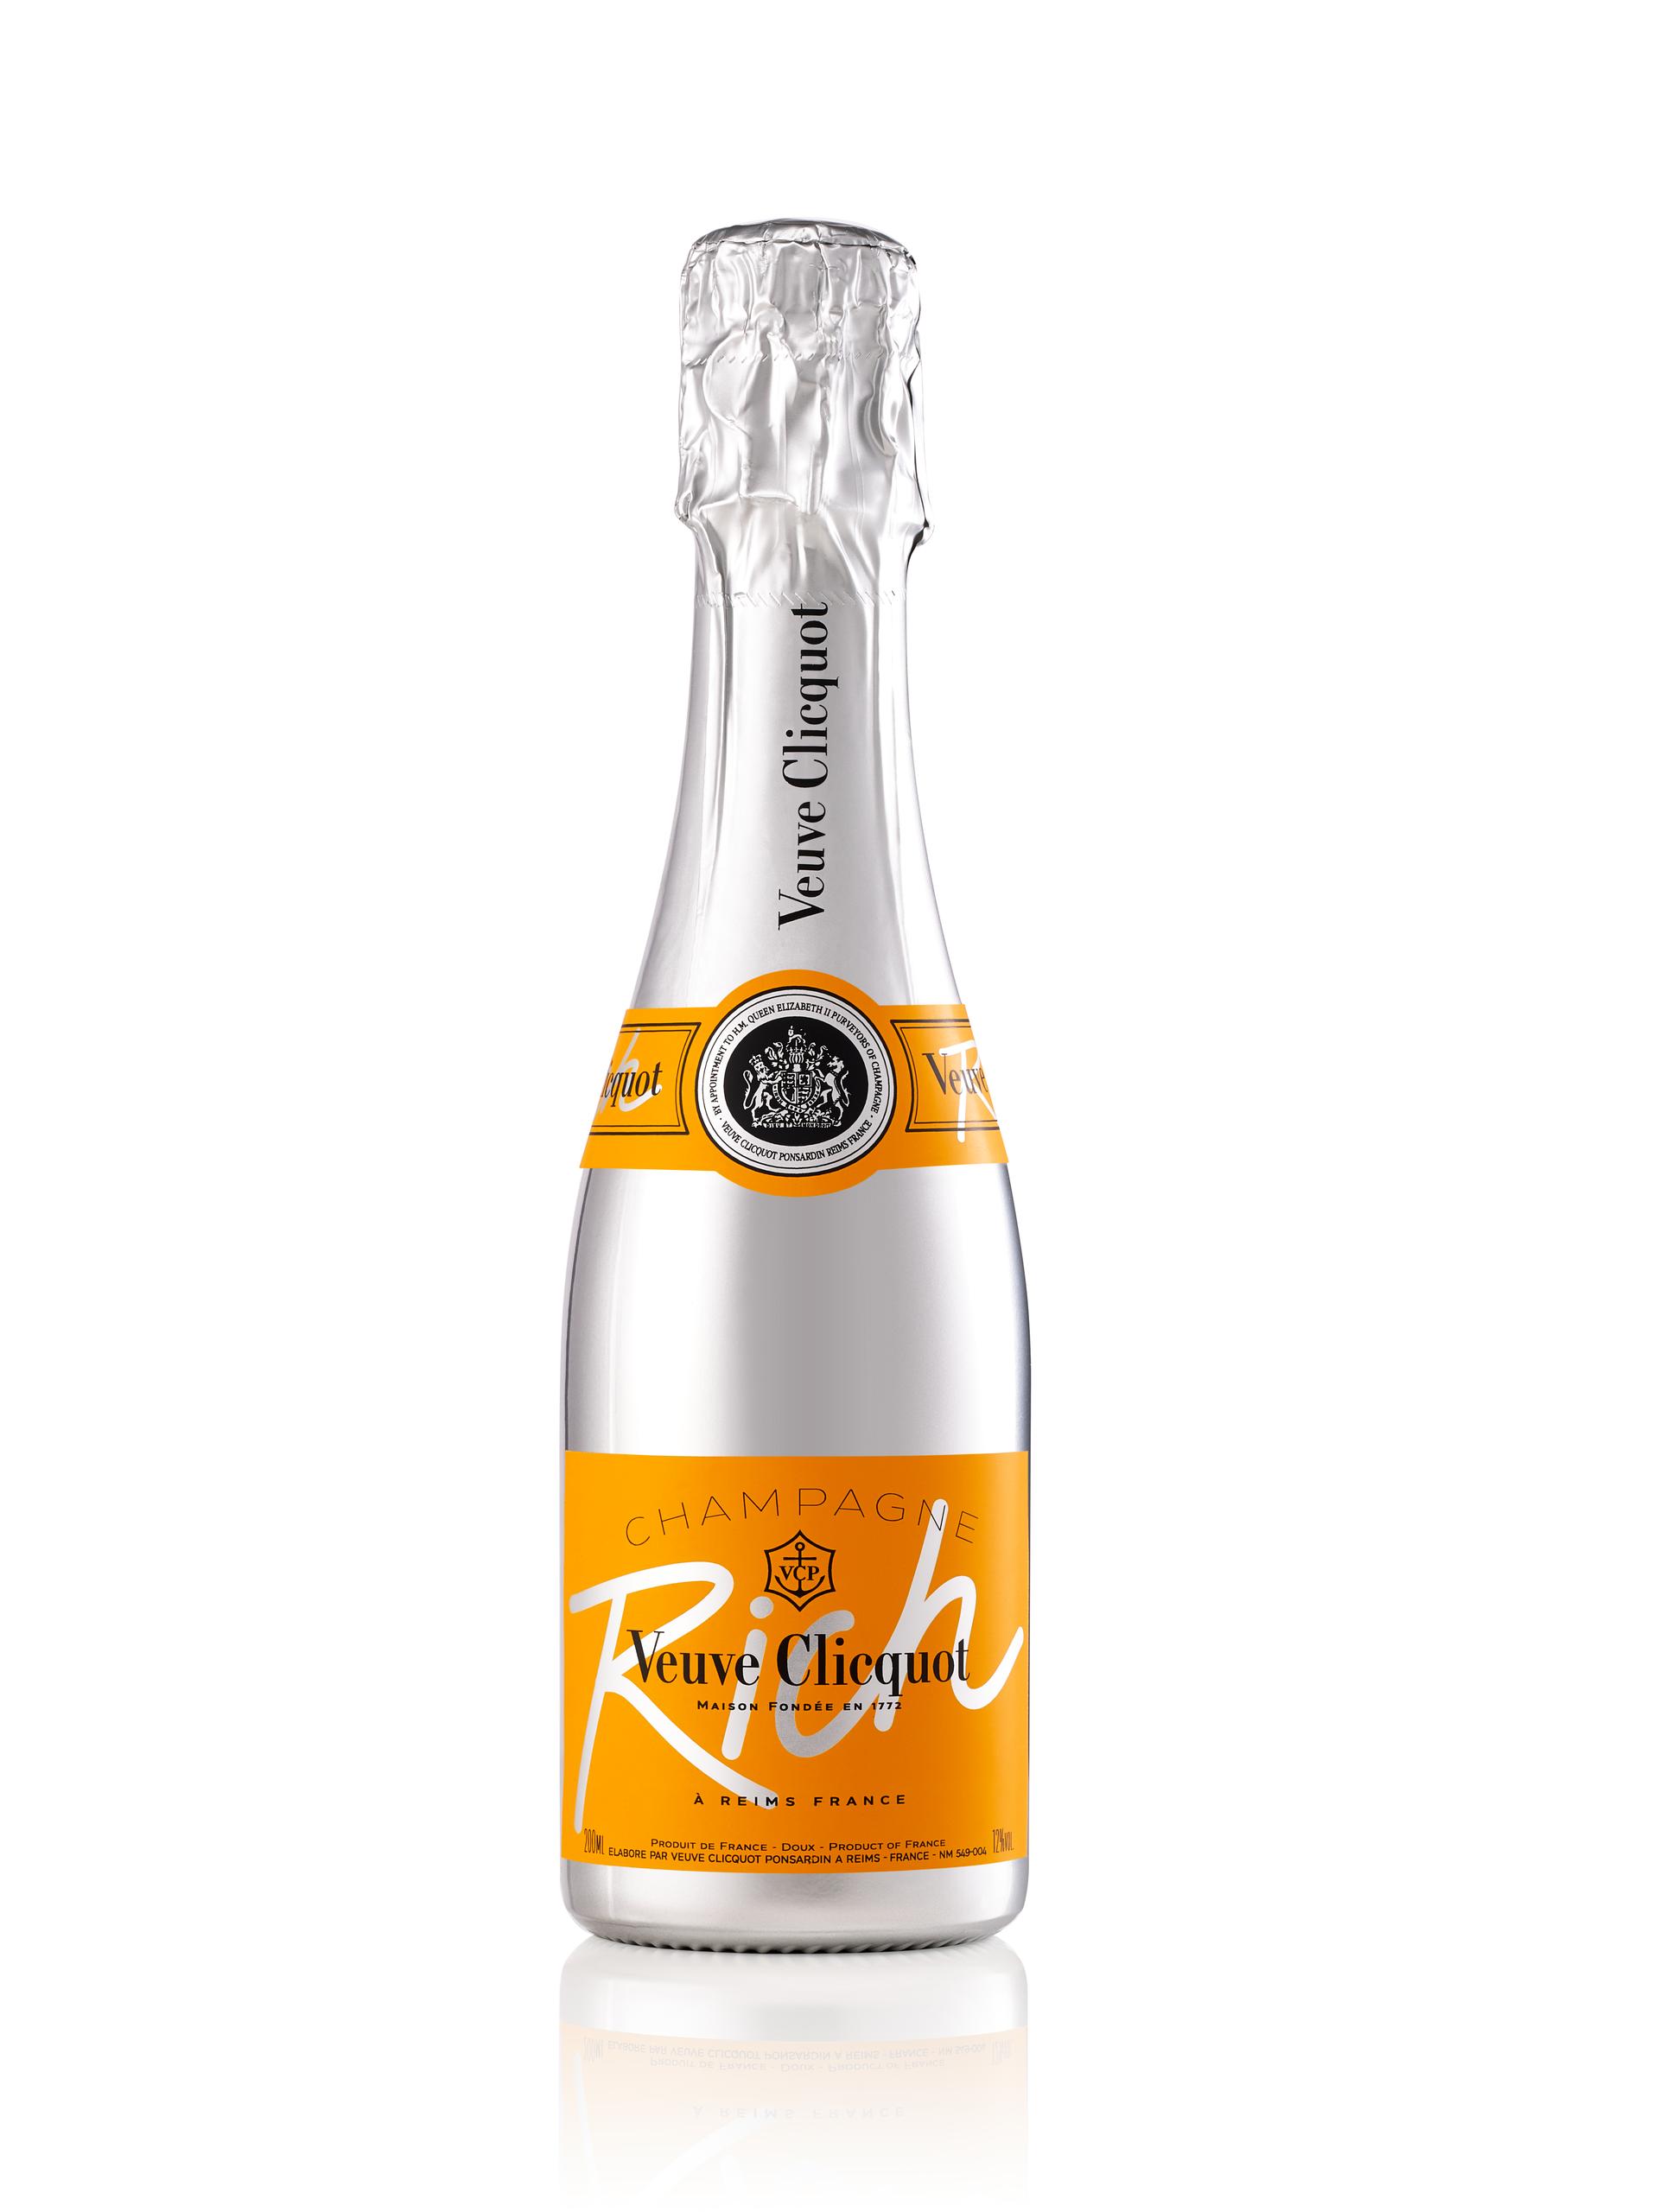 Nuevo formato del Veuve Clicquot Rich en botellita de 187 ml: Petit Rich. De La Bodega de Méndez. (Suministrada)